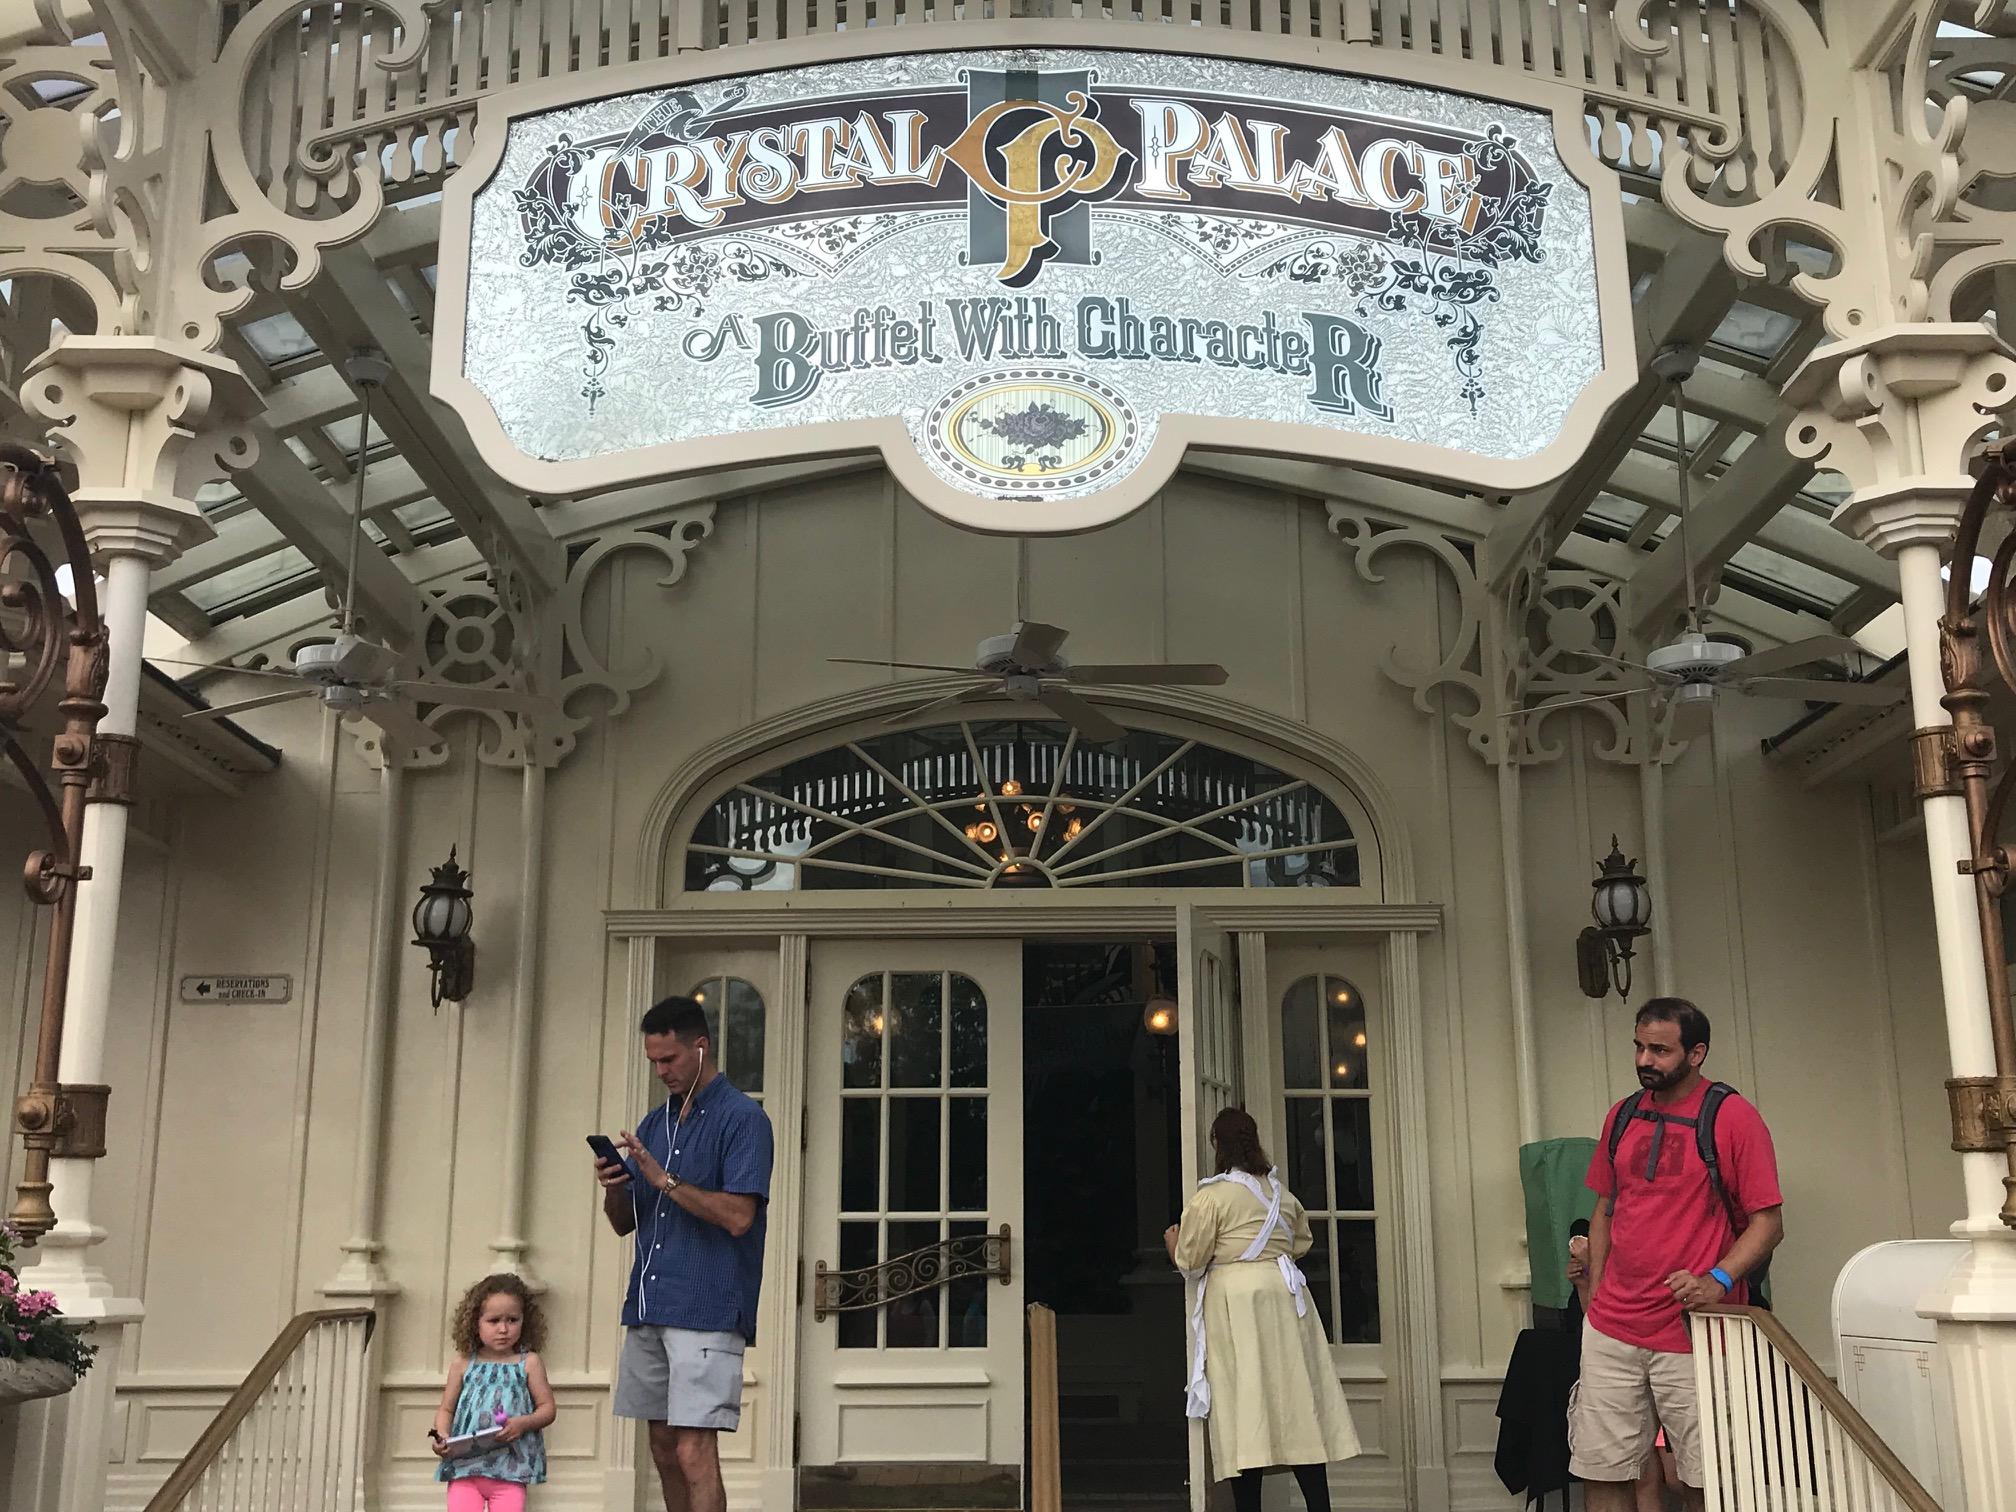 Crystal Palace menu